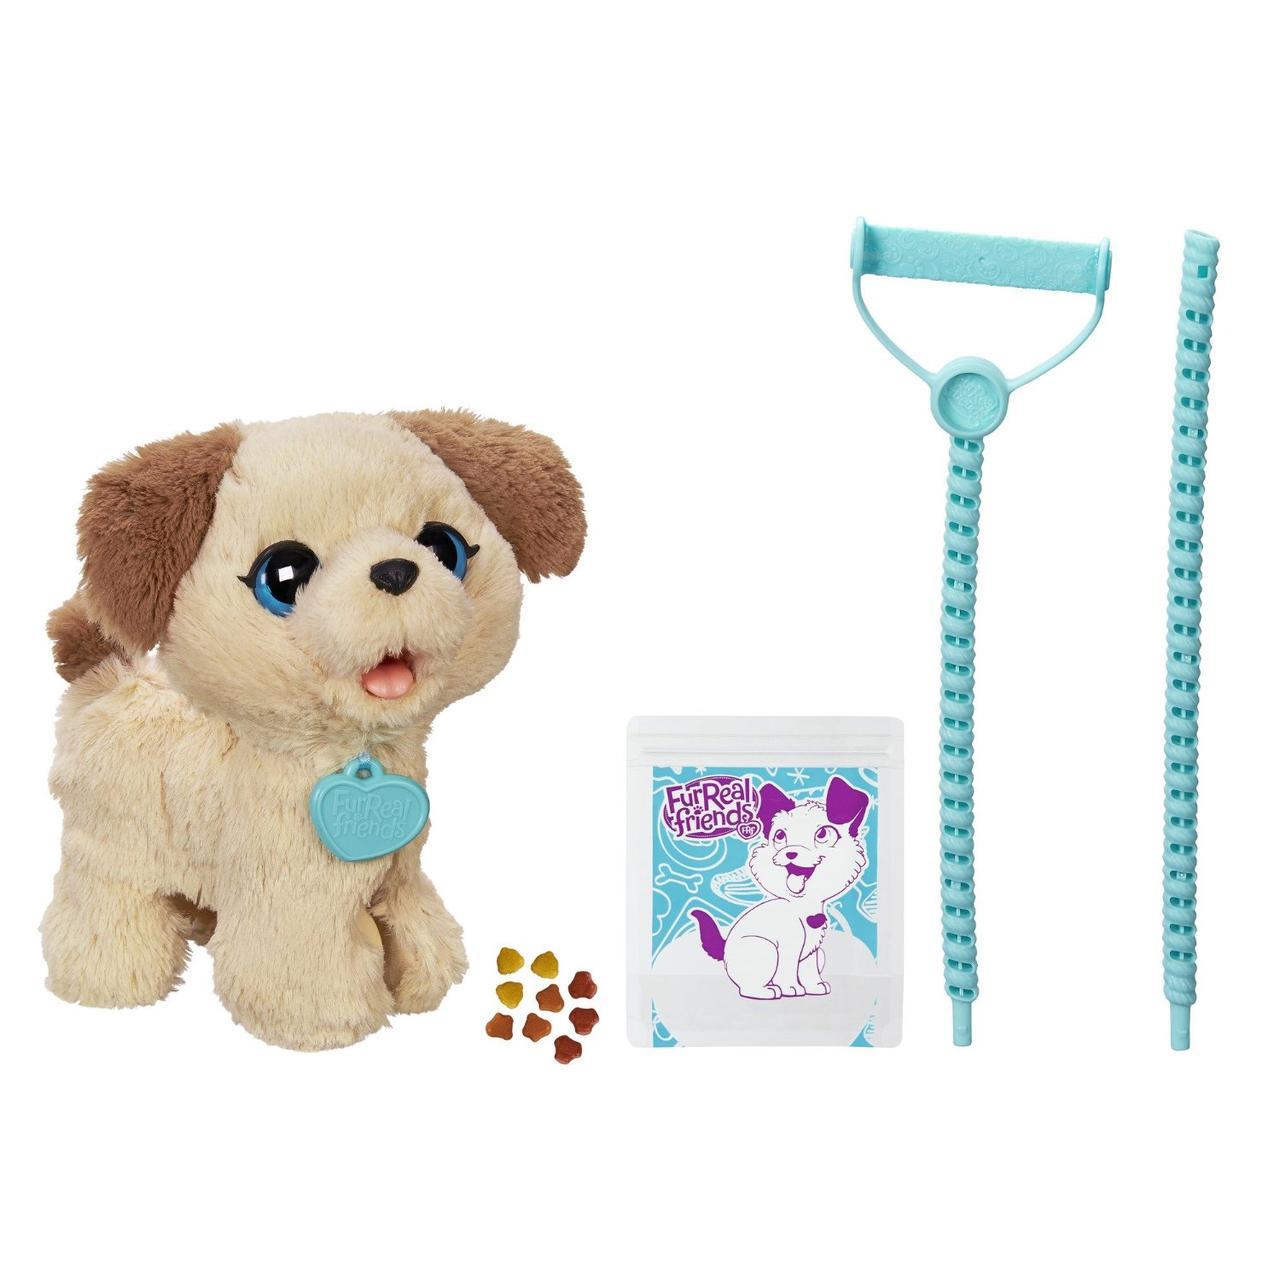 Интерактивный веселый щенок Пакс FurReal Friends Pax, My Poopin' Pup Hasbro